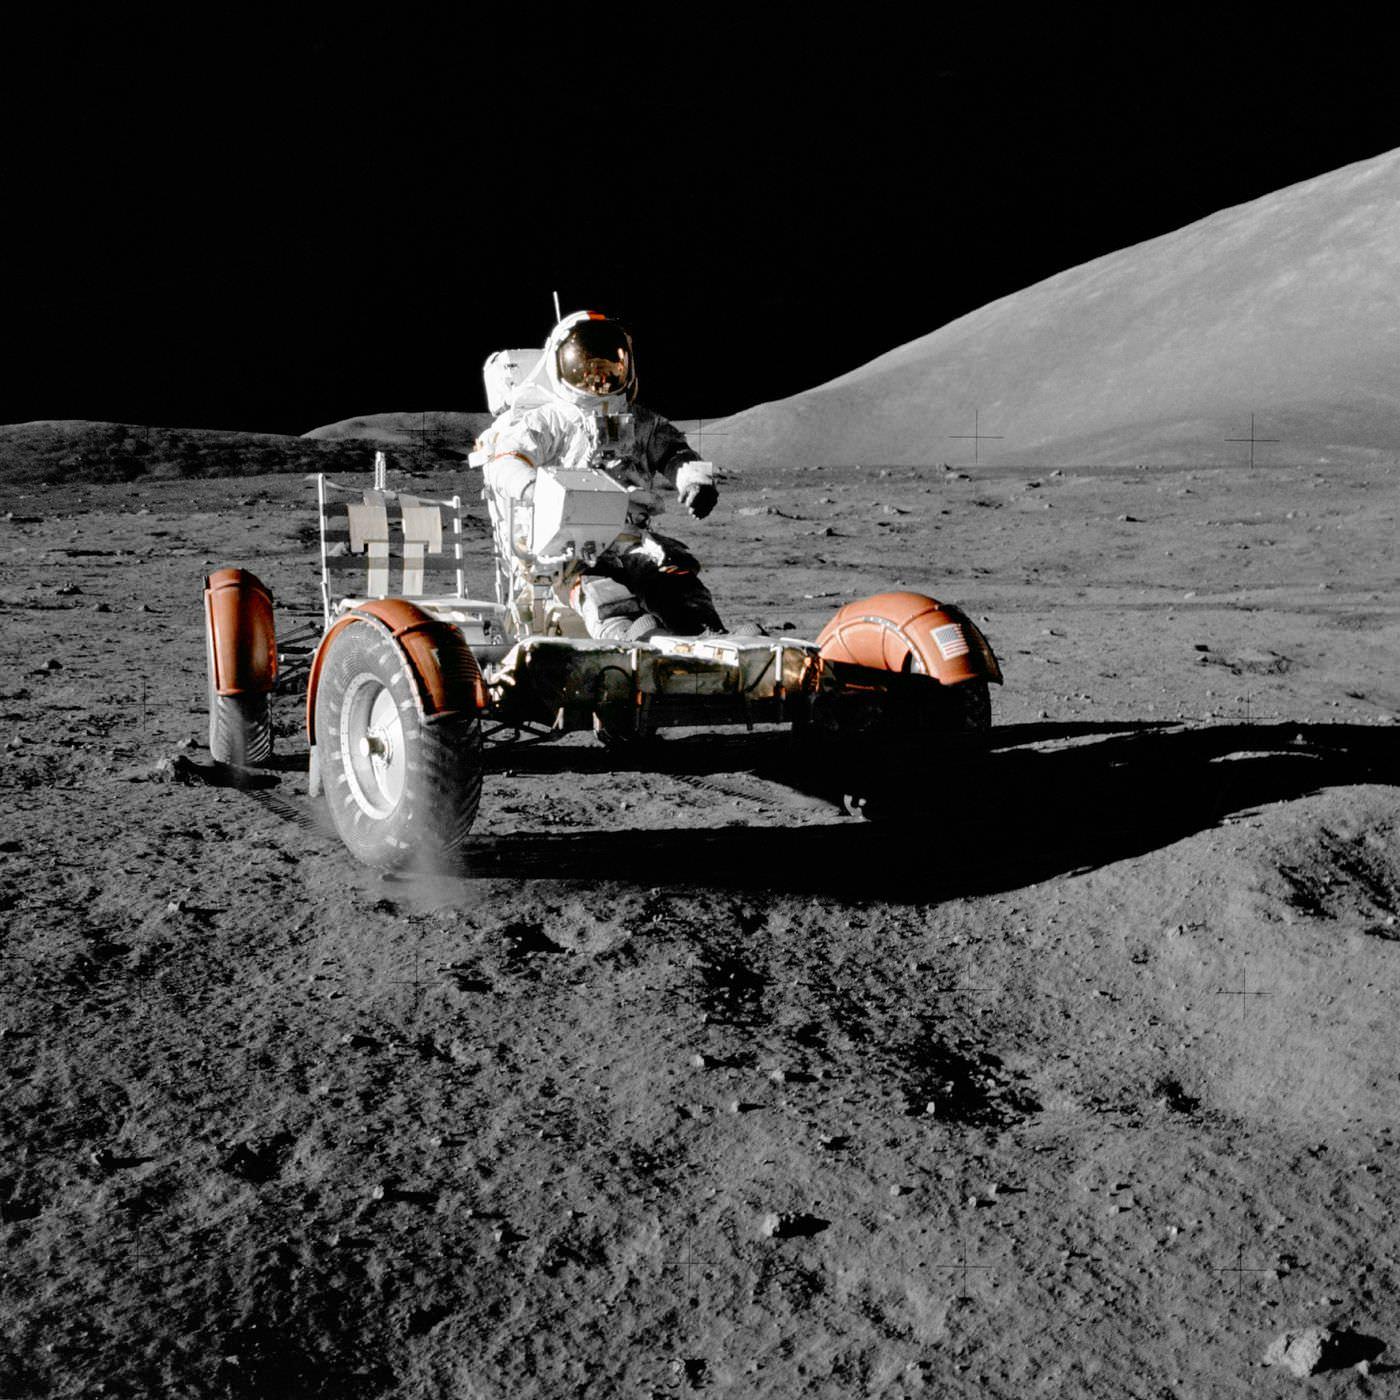 یوجین سرنان سوار بر خودرو ماه پیمای ماموریت آپولو ۱۷